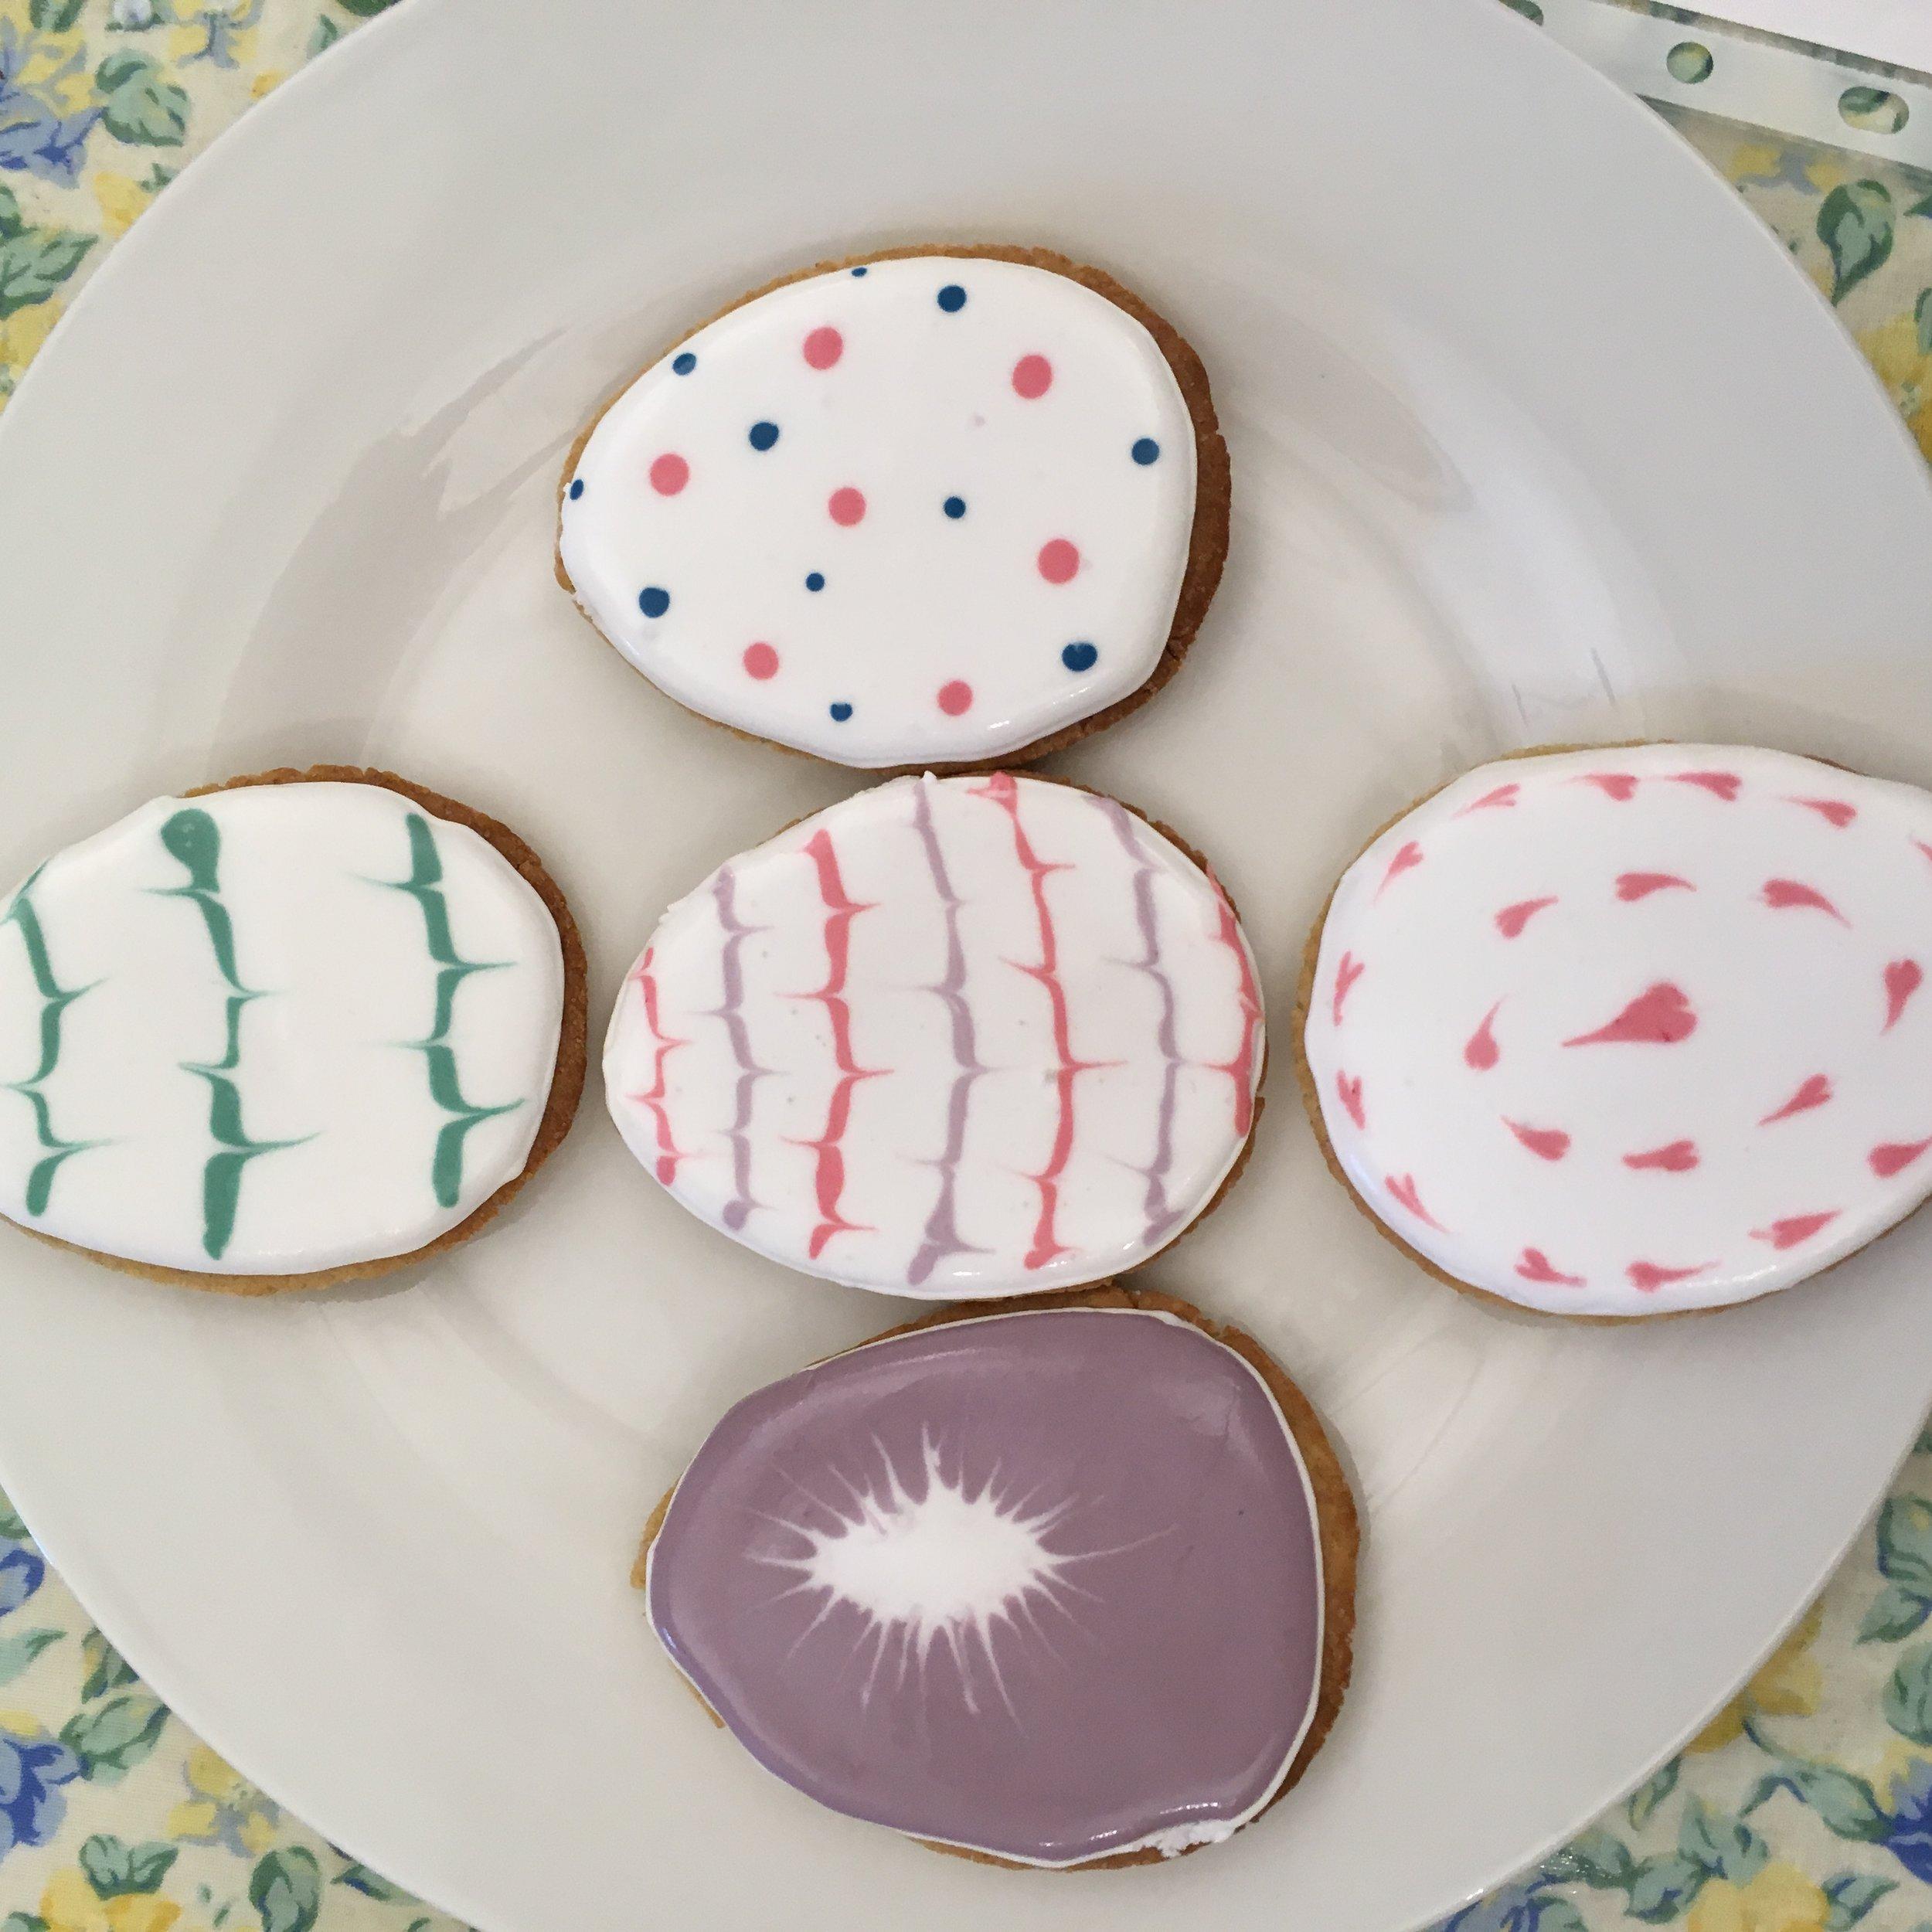 CAP-workshop-iced-biscuits-3